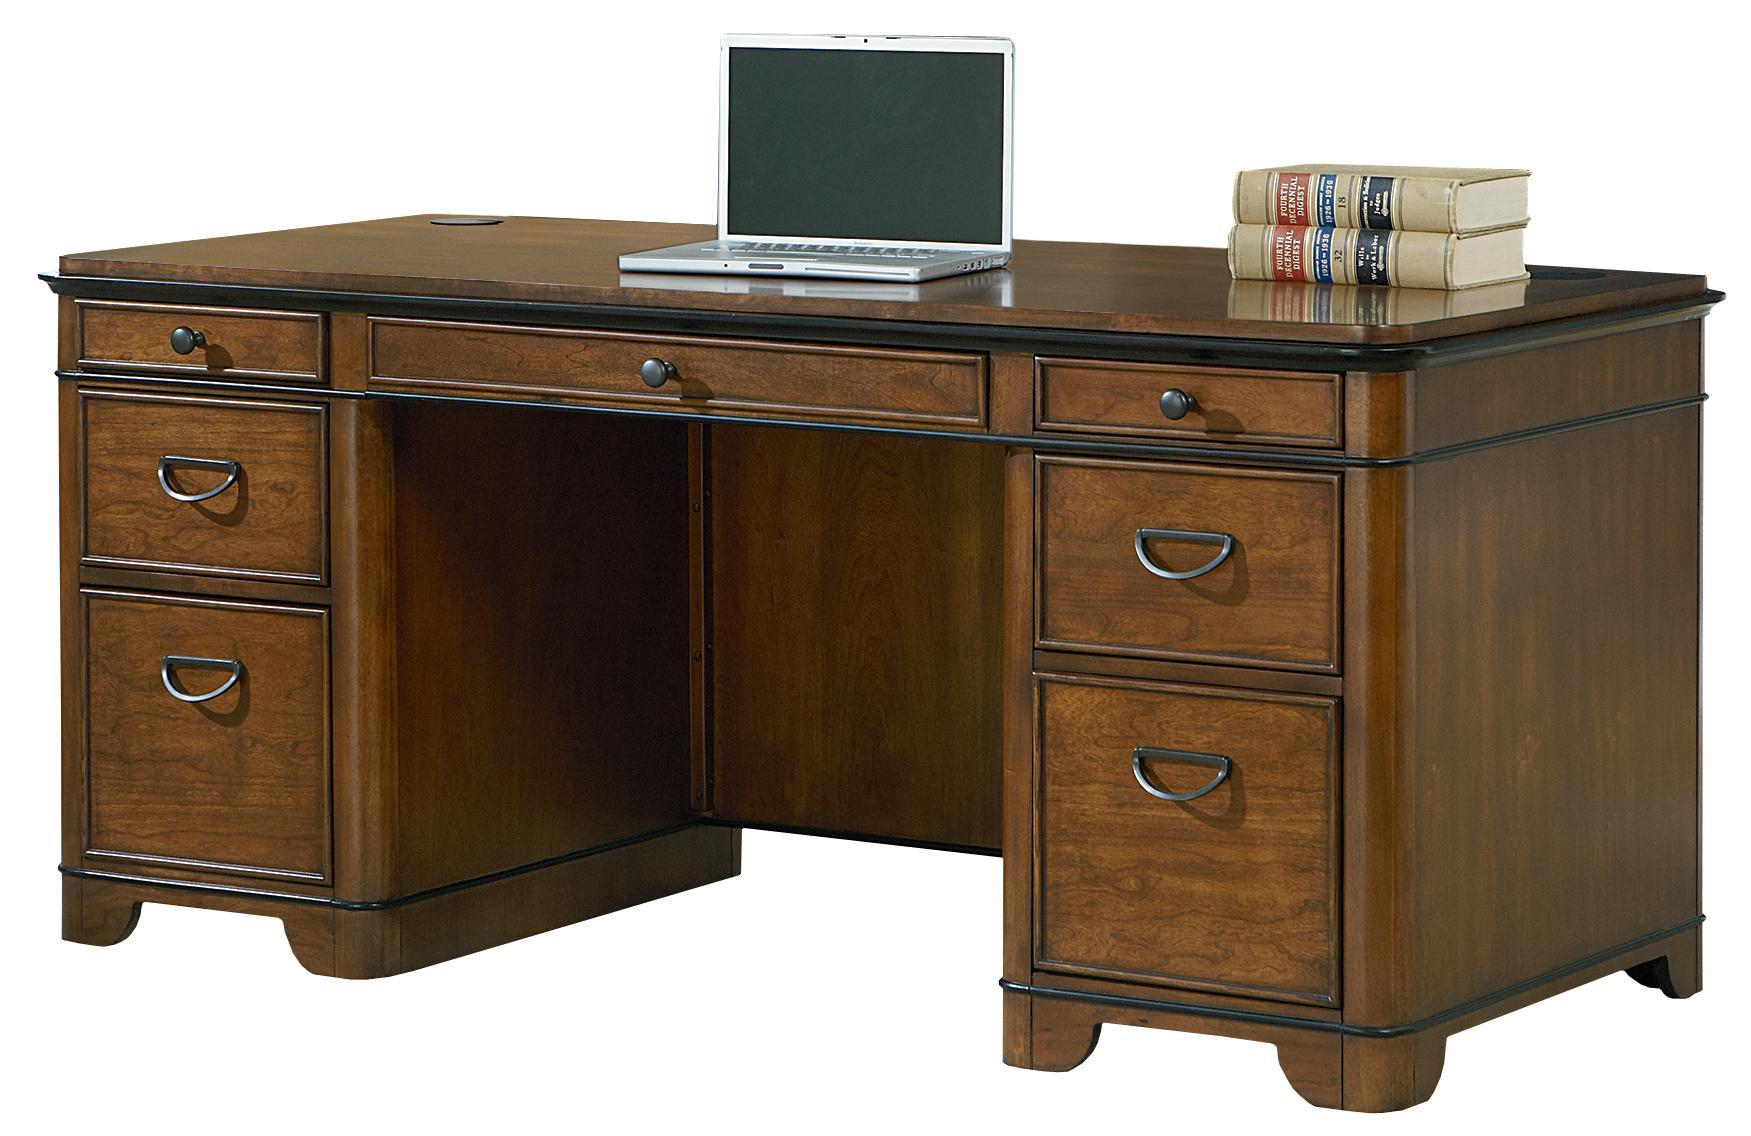 amazon com martin furniture kensington double pedestal executive rh amazon com modern executive computer desk modern executive computer desk